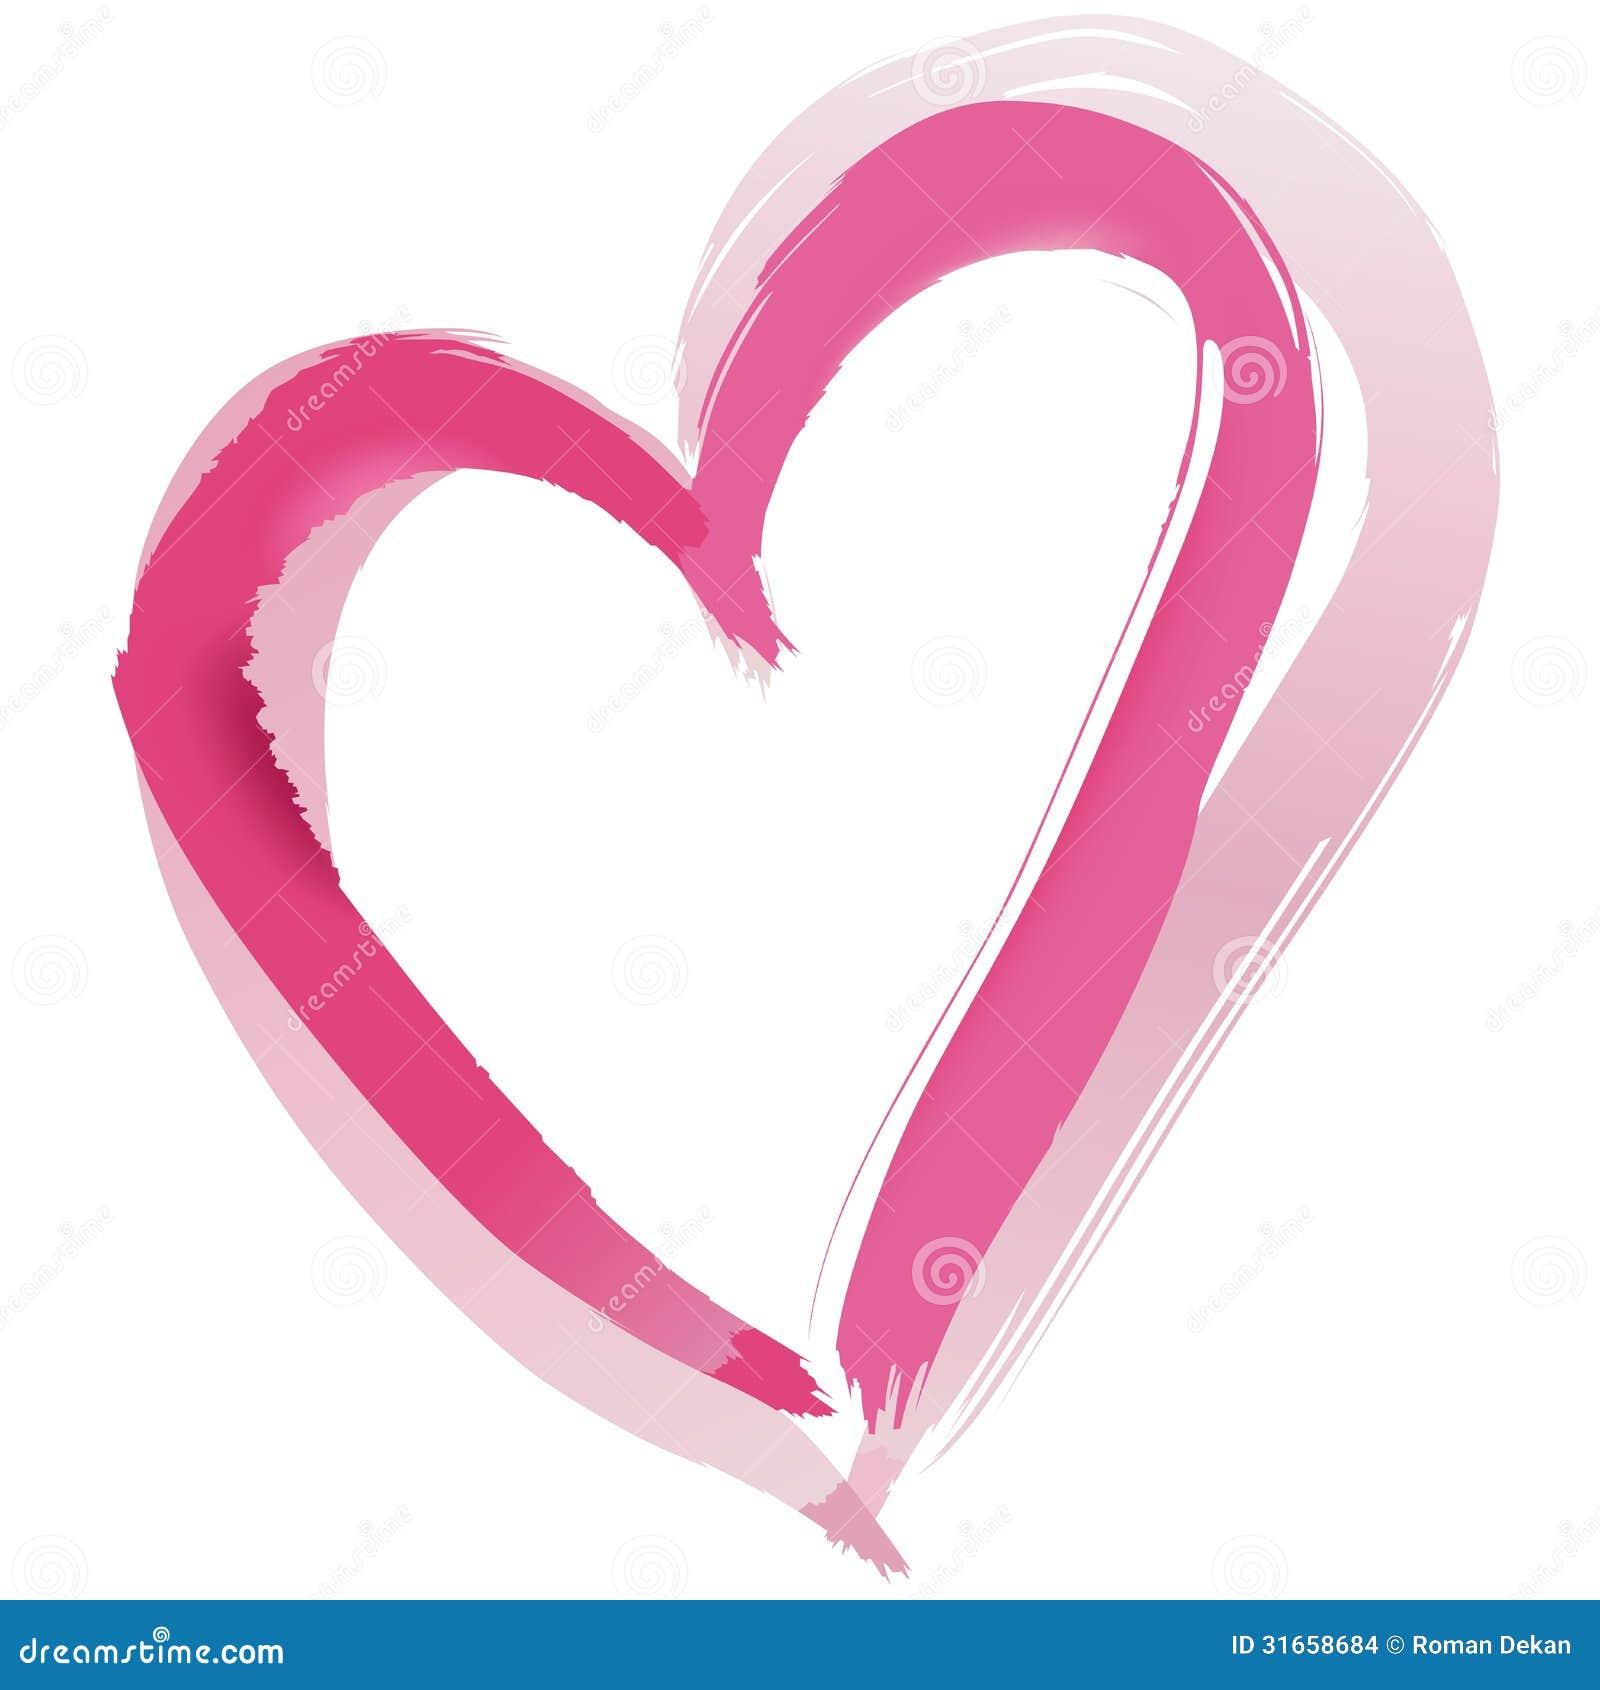 painted heart shape stock images image 31658684. Black Bedroom Furniture Sets. Home Design Ideas